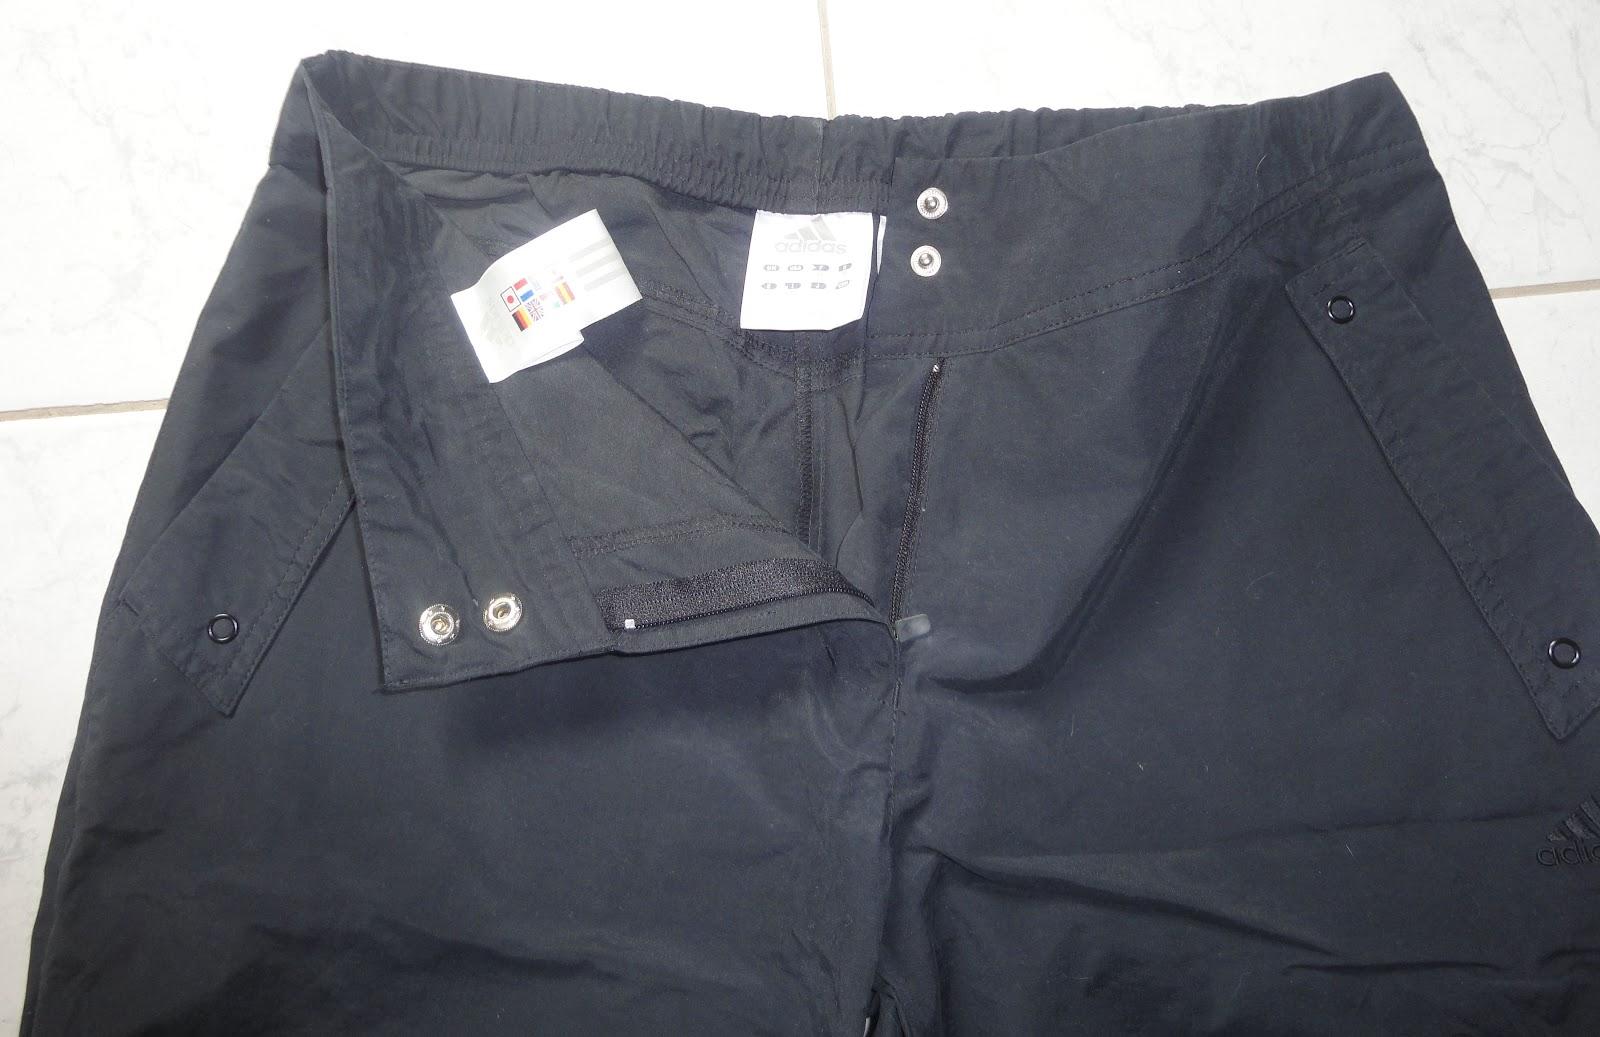 Miss coco vide son dressing montpellier h rault 34 pantalon noir sport adidas t 40 - Vide dressing montpellier ...